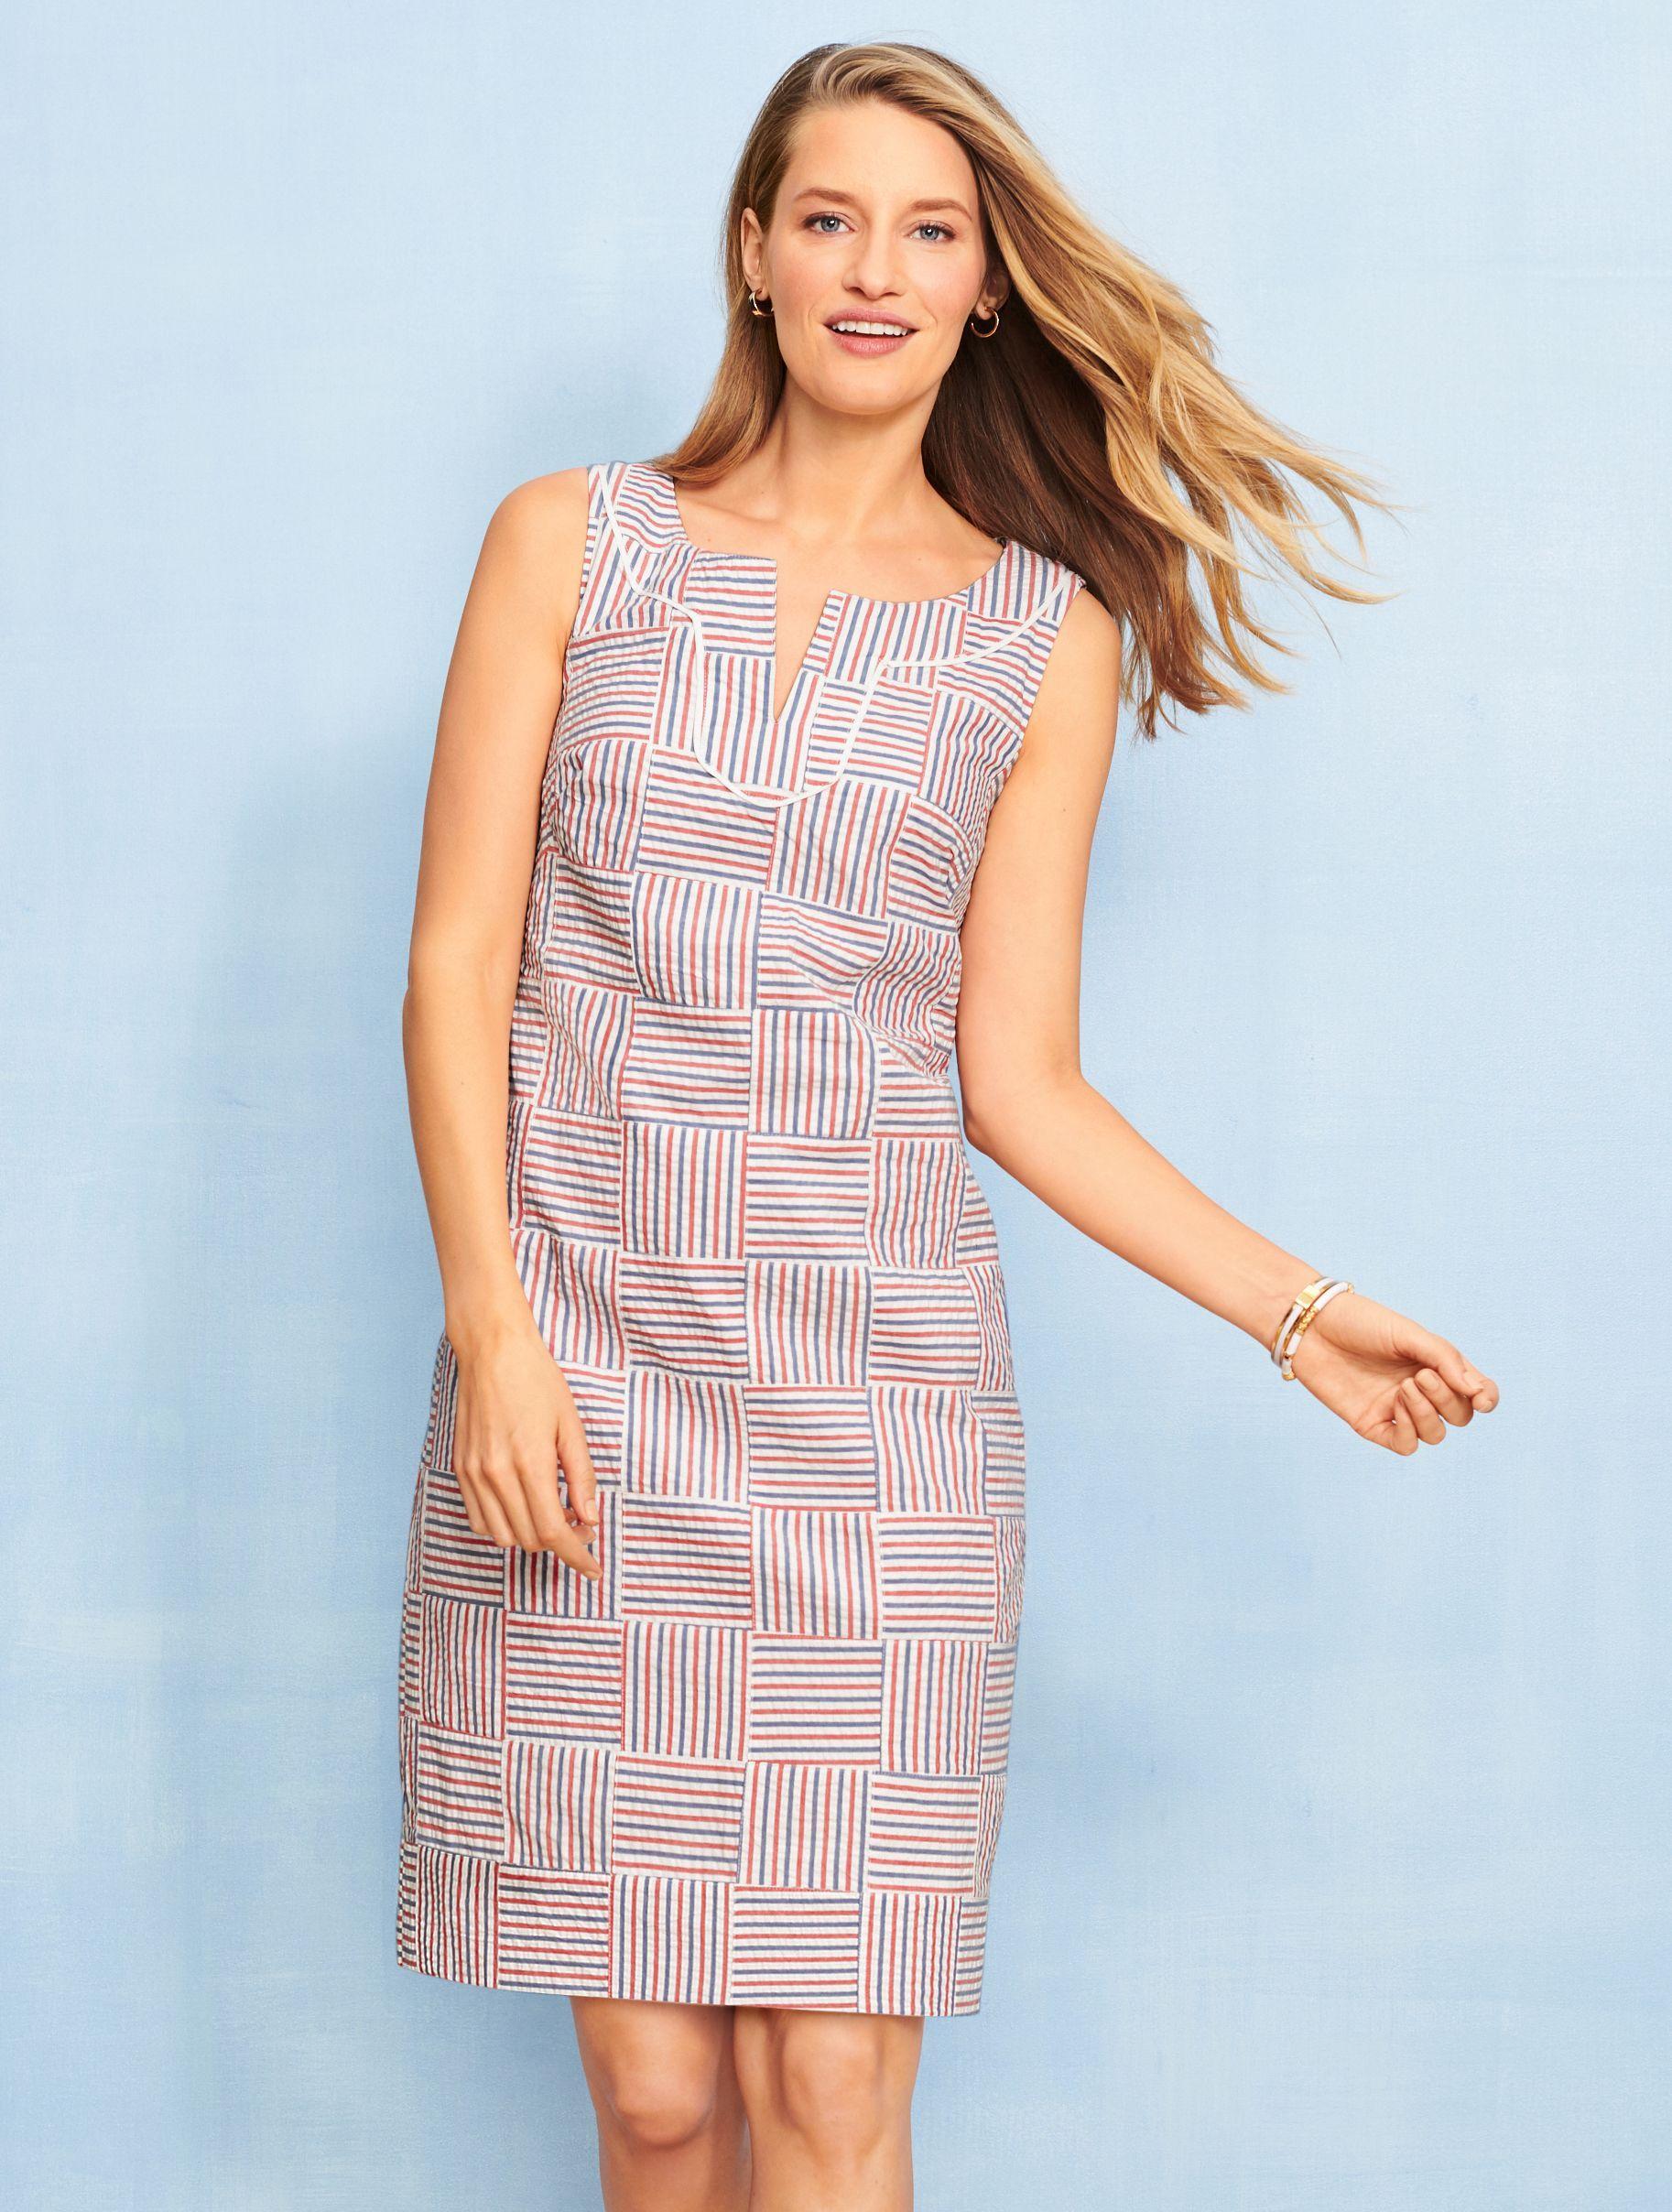 A Modern Spin On Preppy Seersucker Our Versatile Shift Dress Features A Classic Stripe Pattern Summer Fashion Outfits Seersucker Dress Indian Designer Outfits